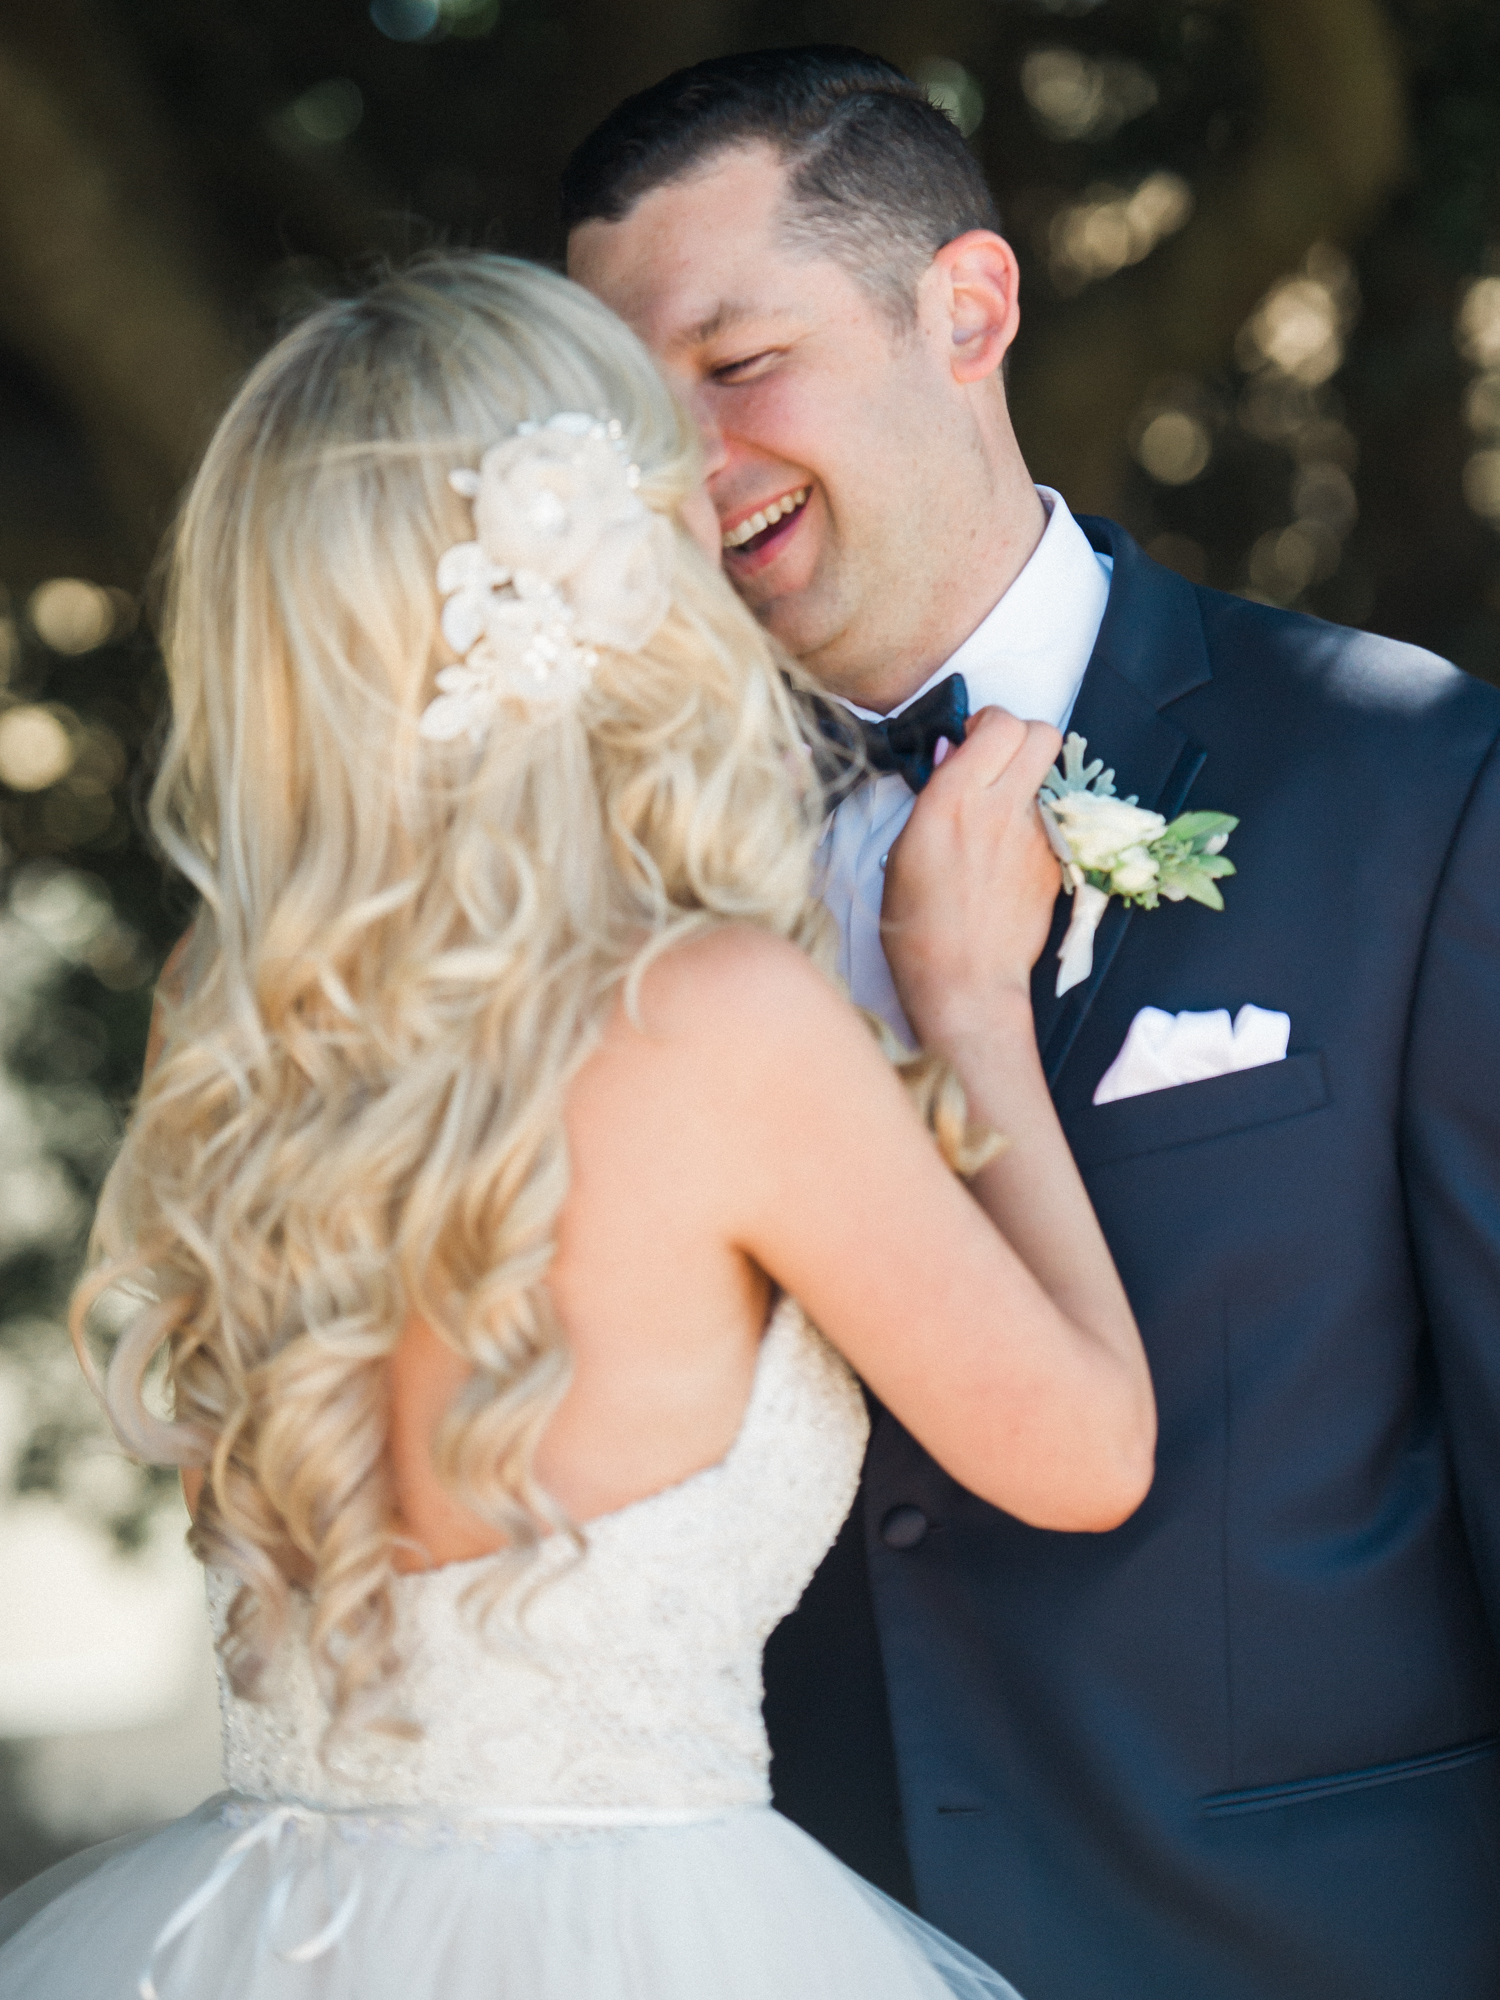 Aimee+Logan_wedding_spp-42.jpg